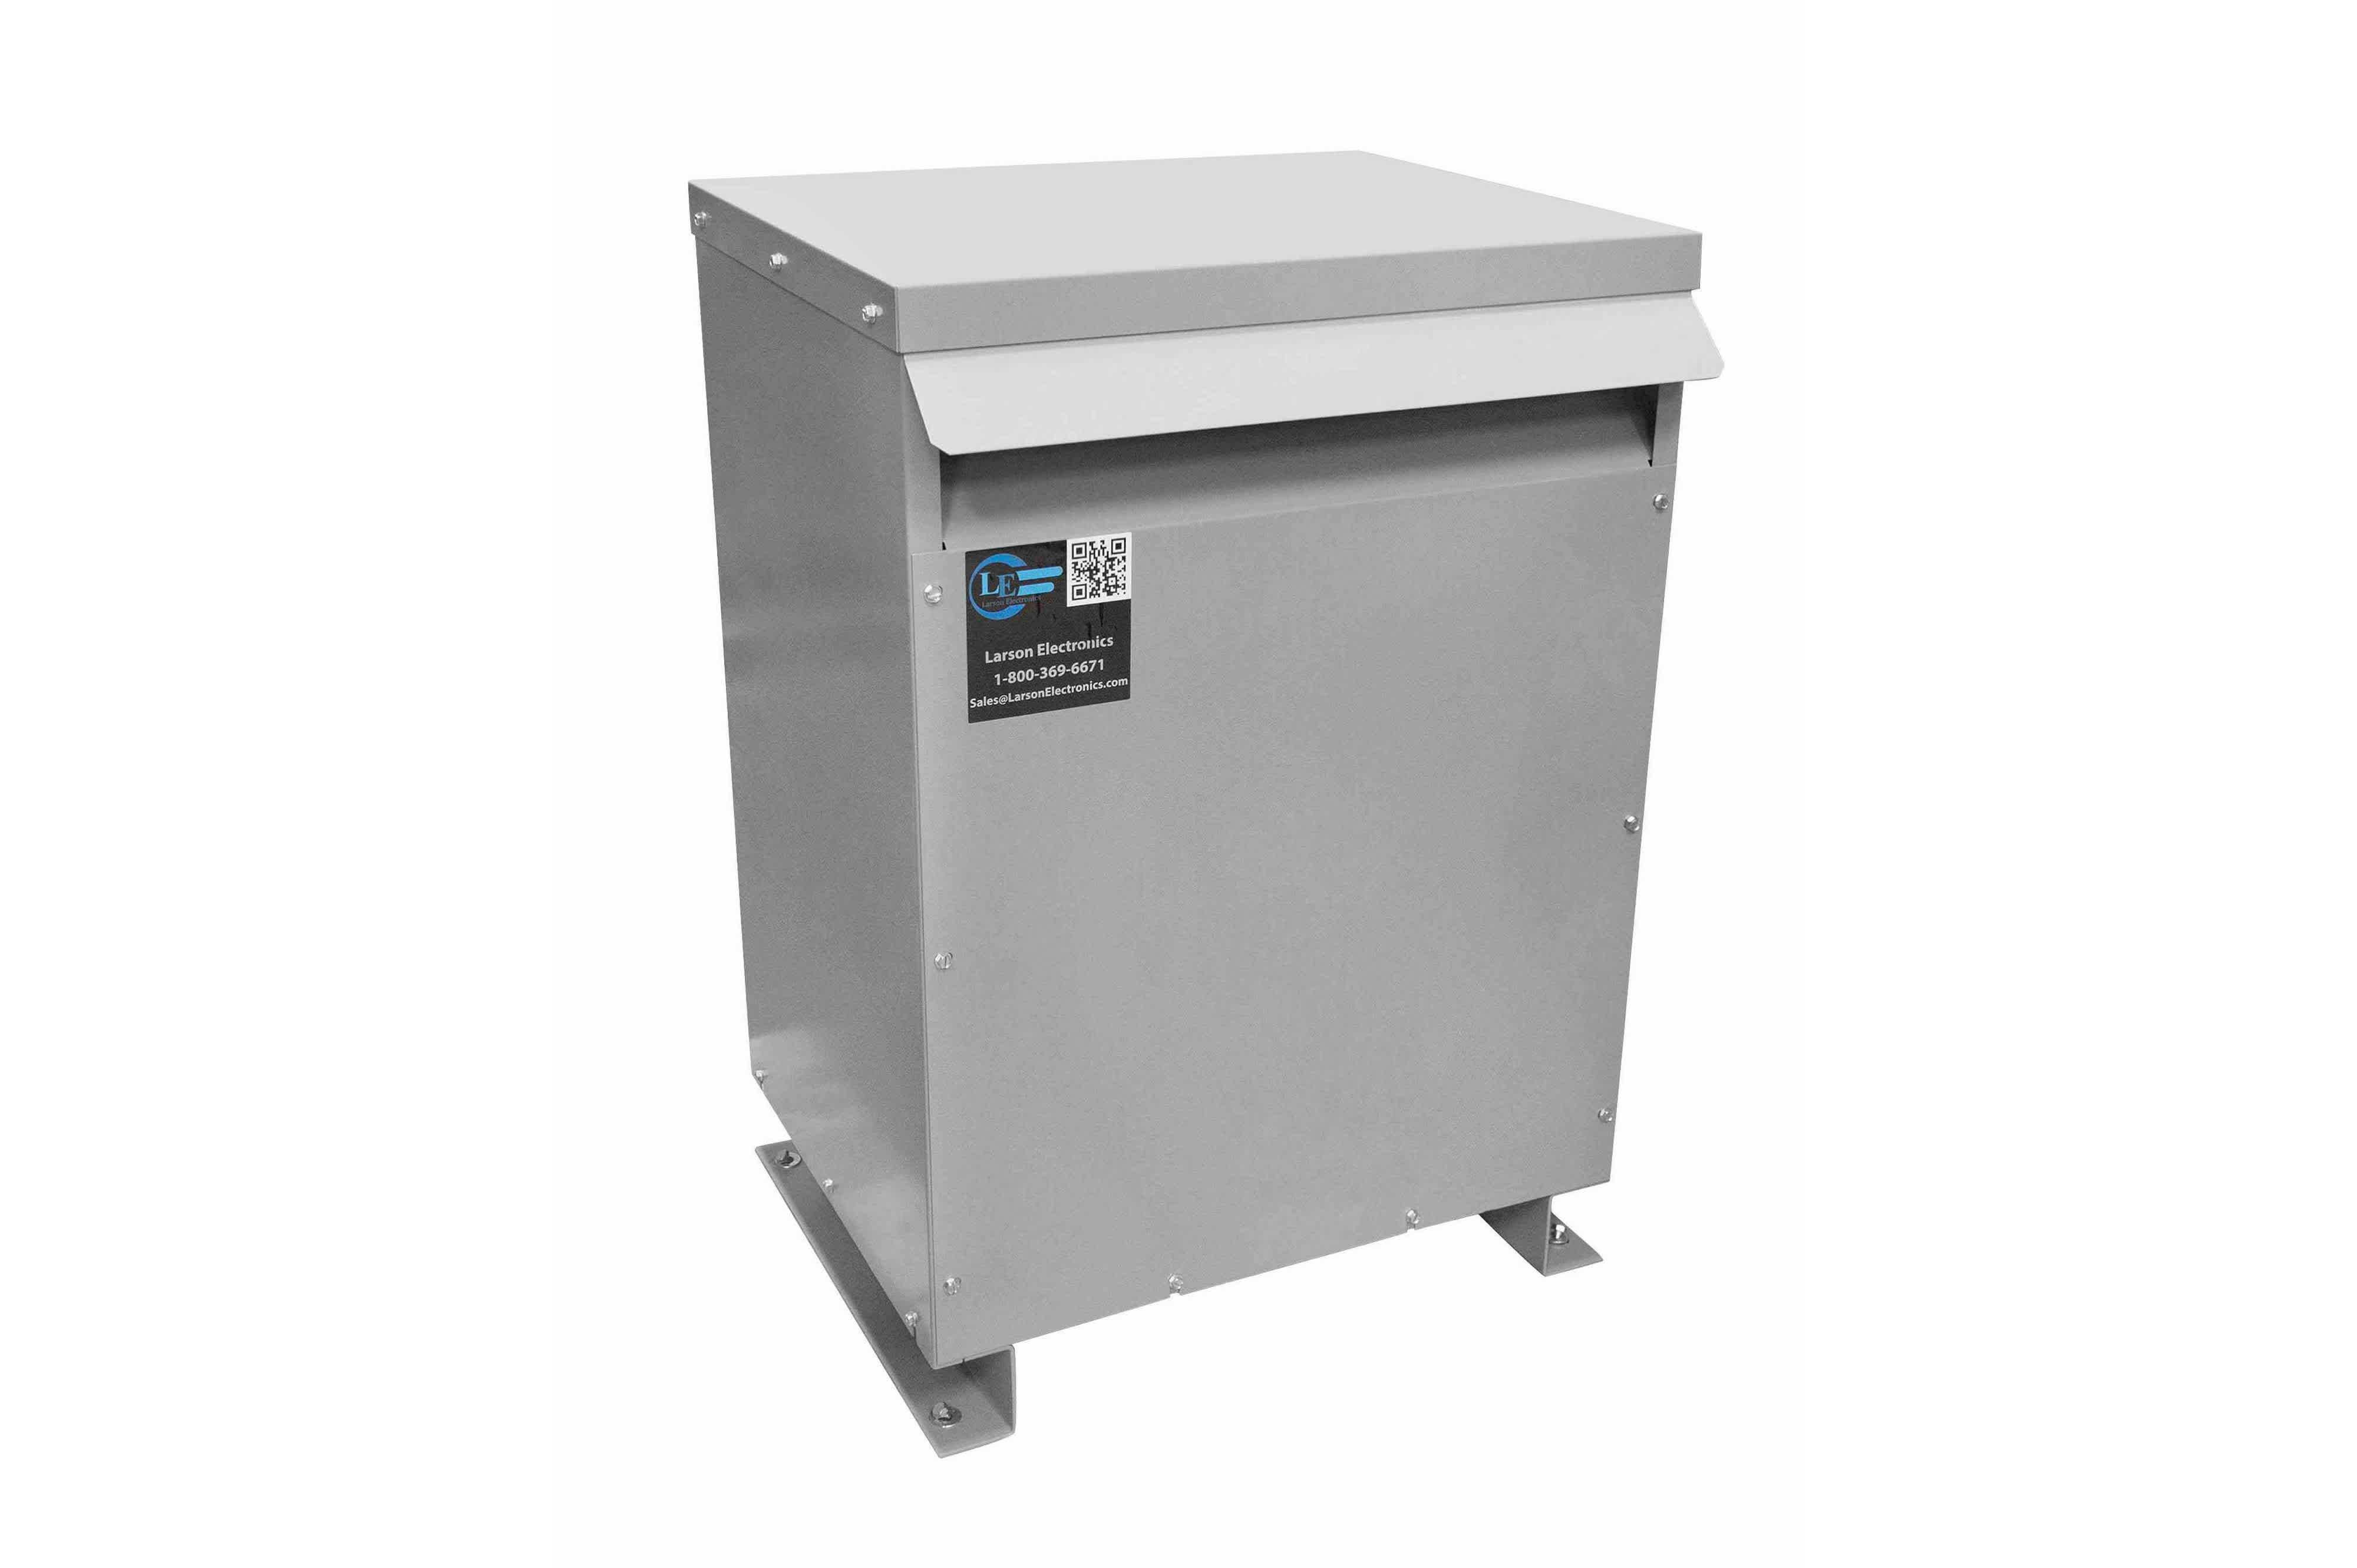 50 kVA 3PH DOE Transformer, 415V Delta Primary, 480Y/277 Wye-N Secondary, N3R, Ventilated, 60 Hz